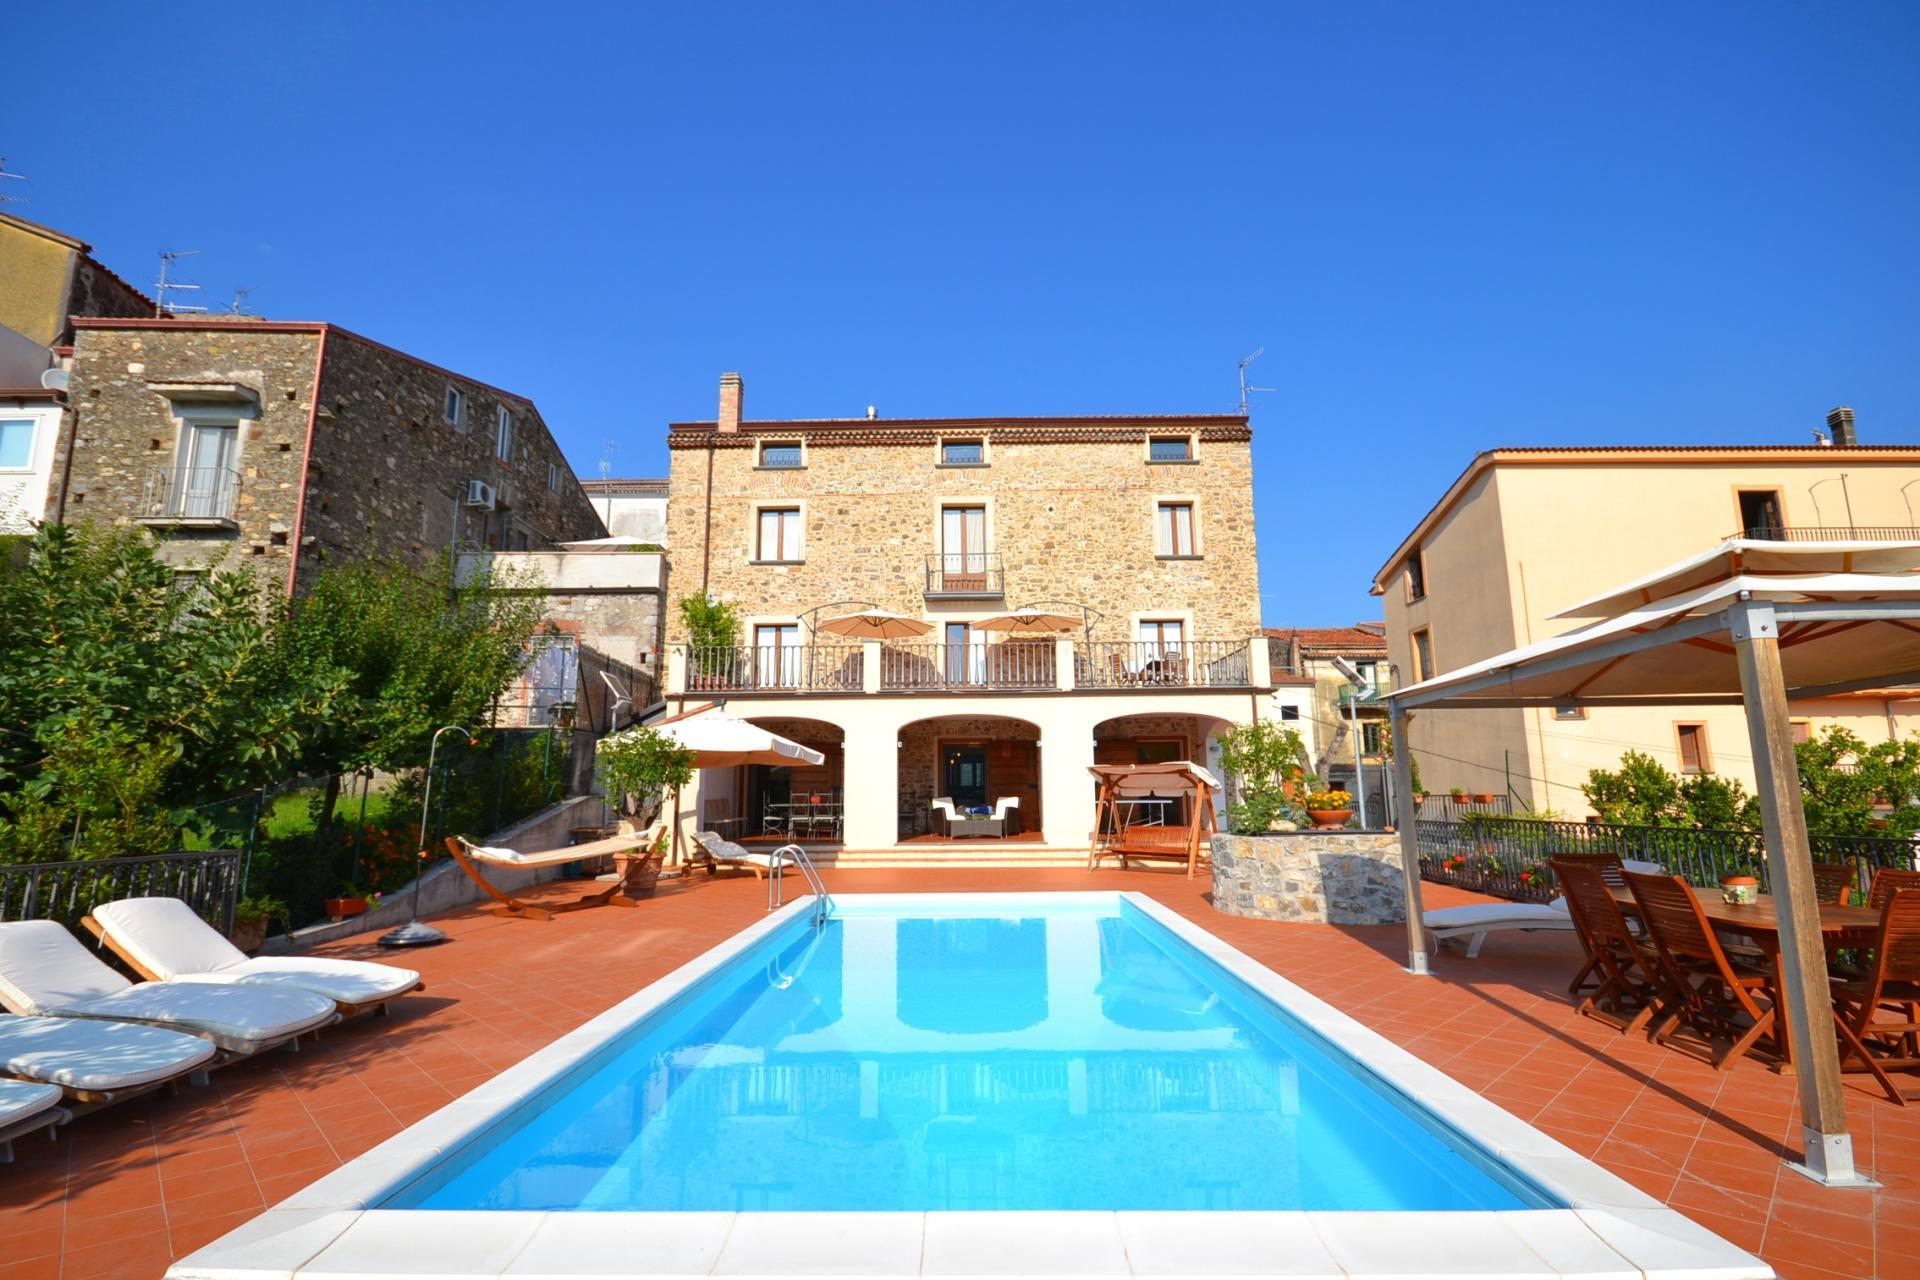 Villa Exterior and Pool, La Livunati, Vibonati, Cilento Coast, Amalfi Coast Campania.